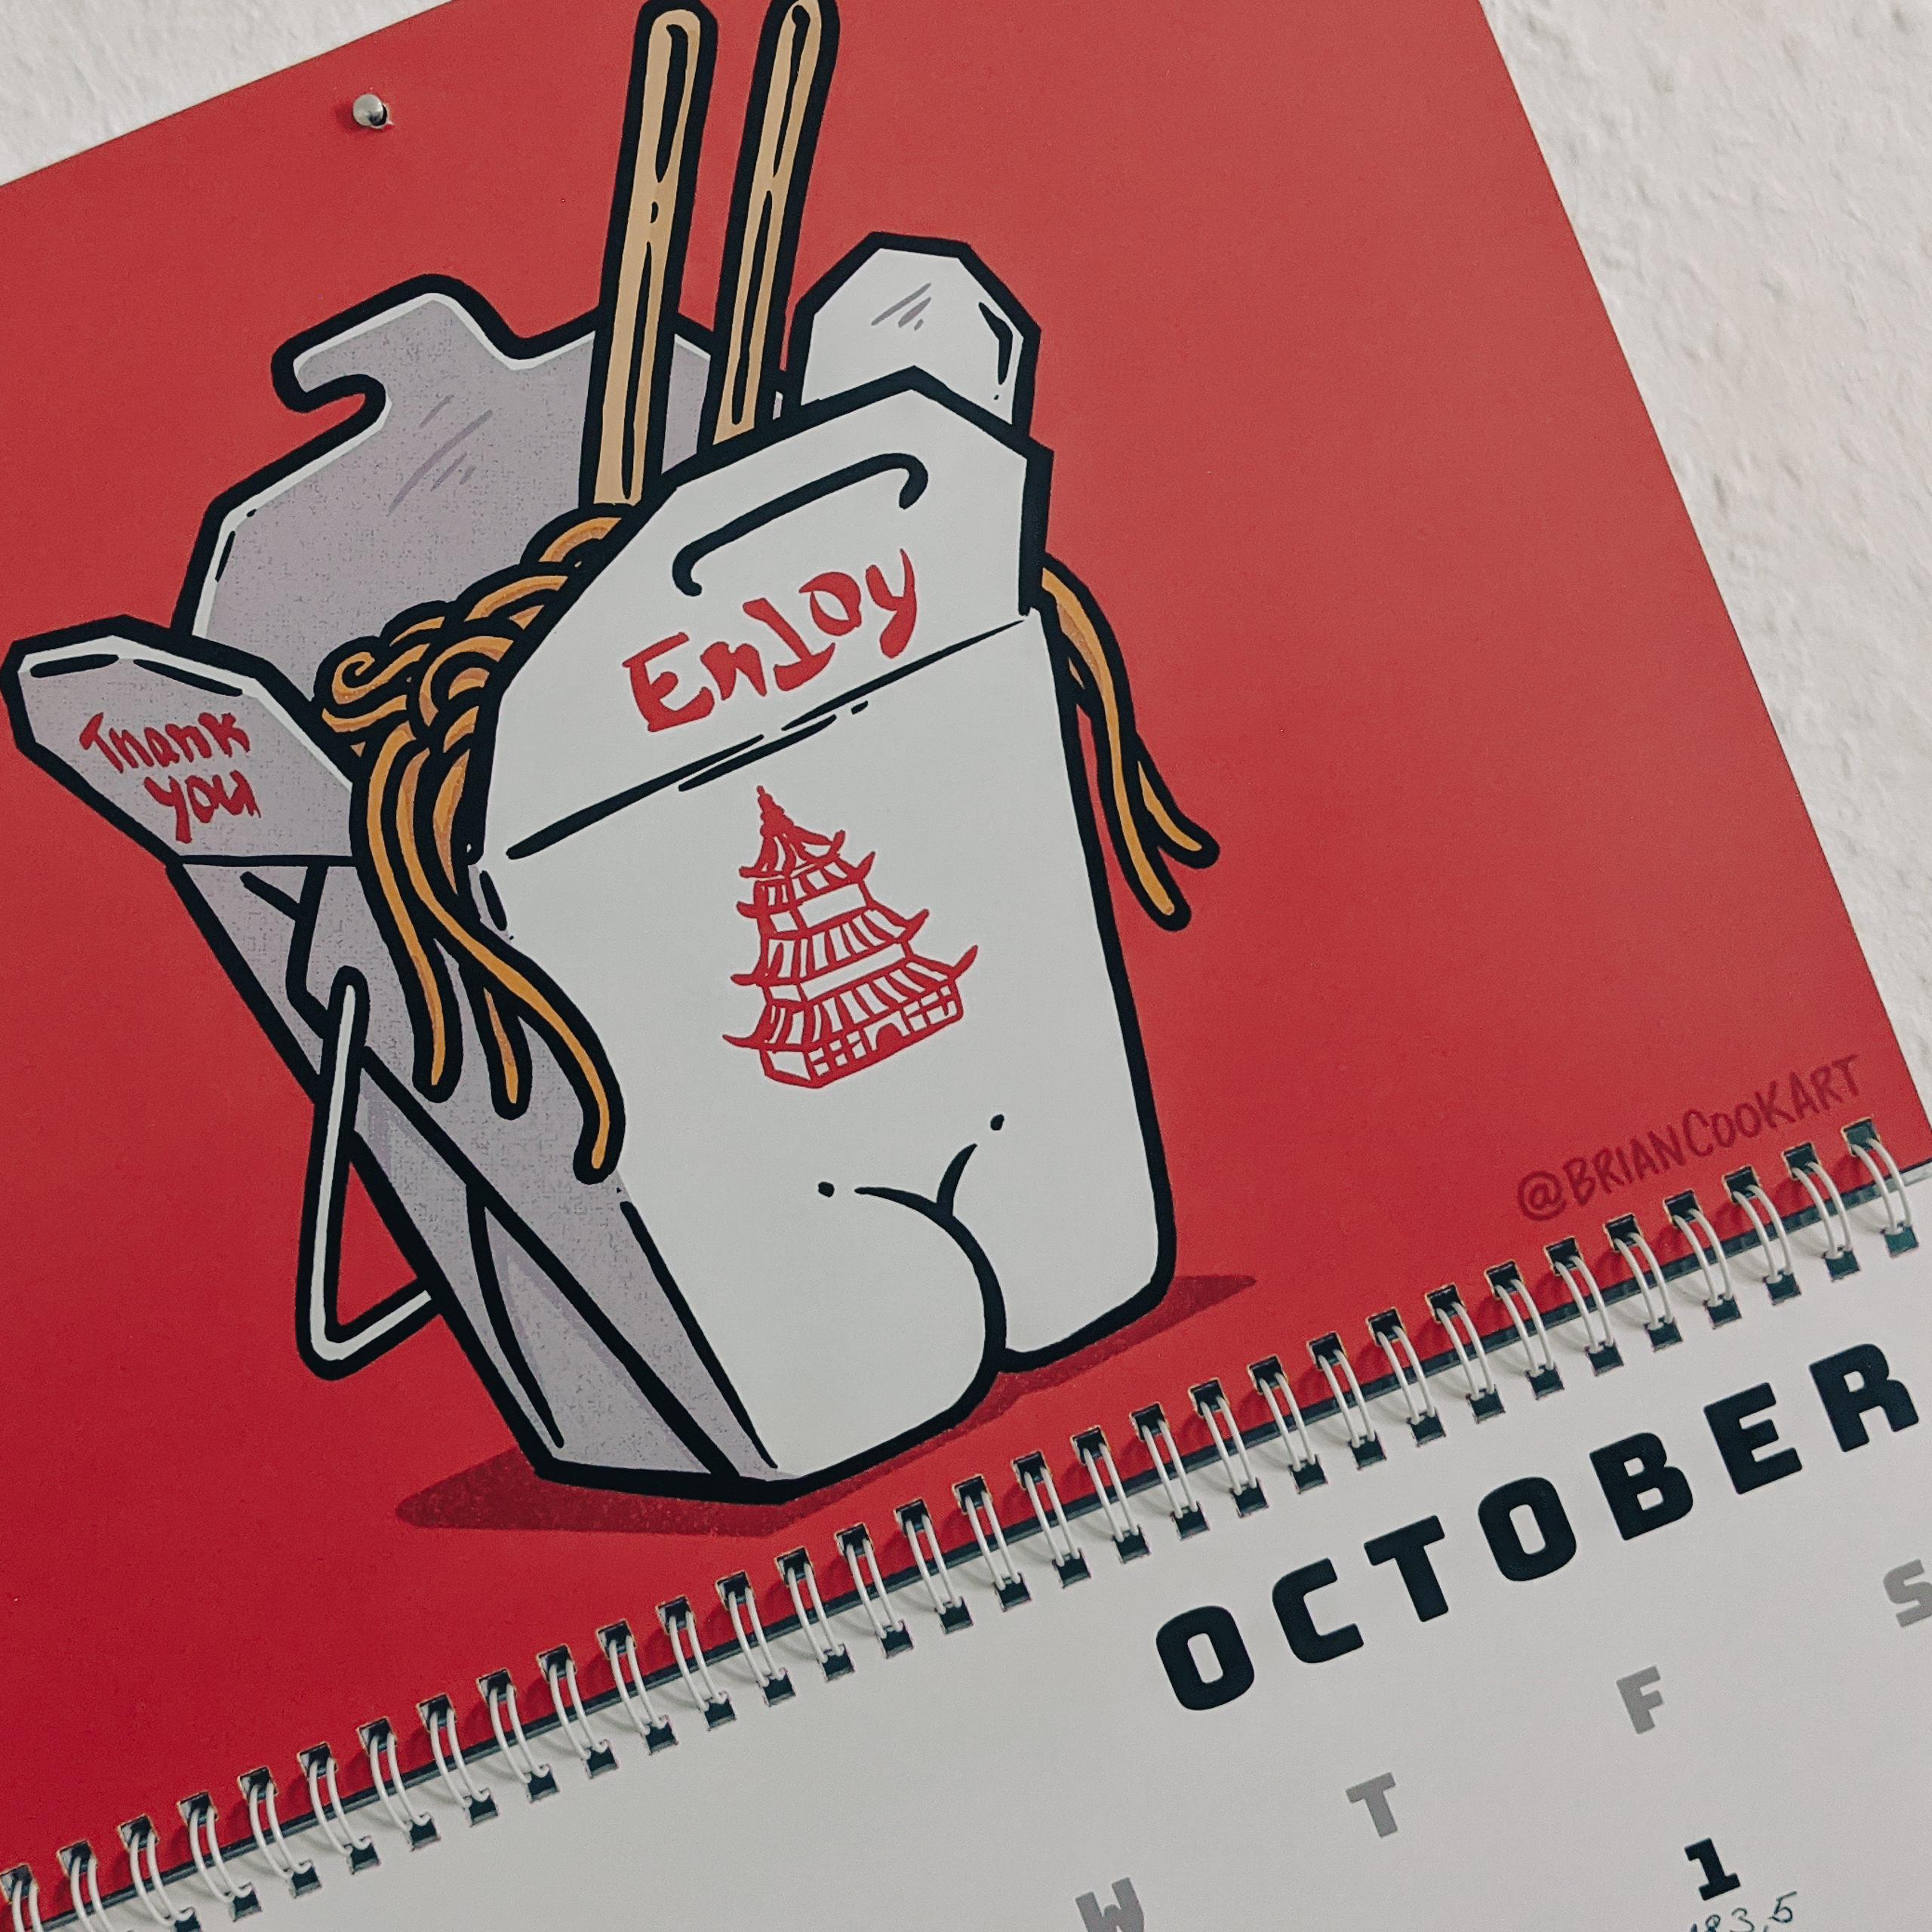 Kalender Butts on Things Brian Cook - Gewichtsupdate Oktober 2021